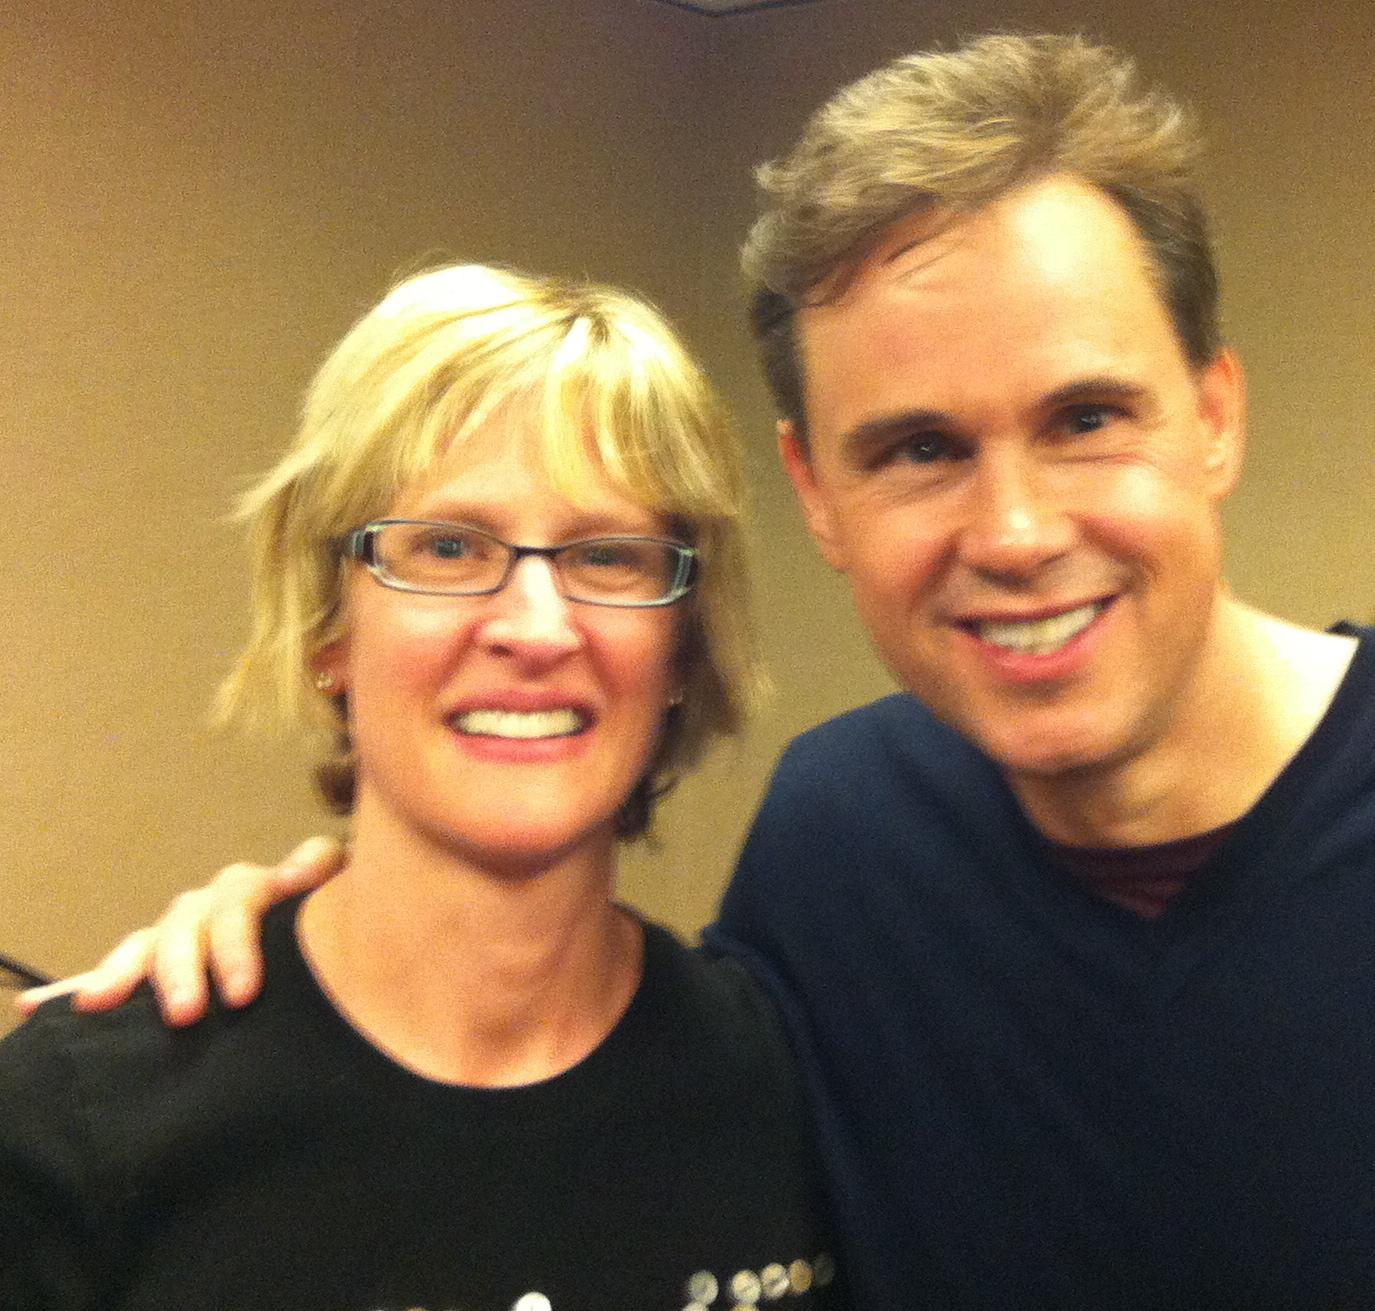 Robert Holden with me in November, 2011